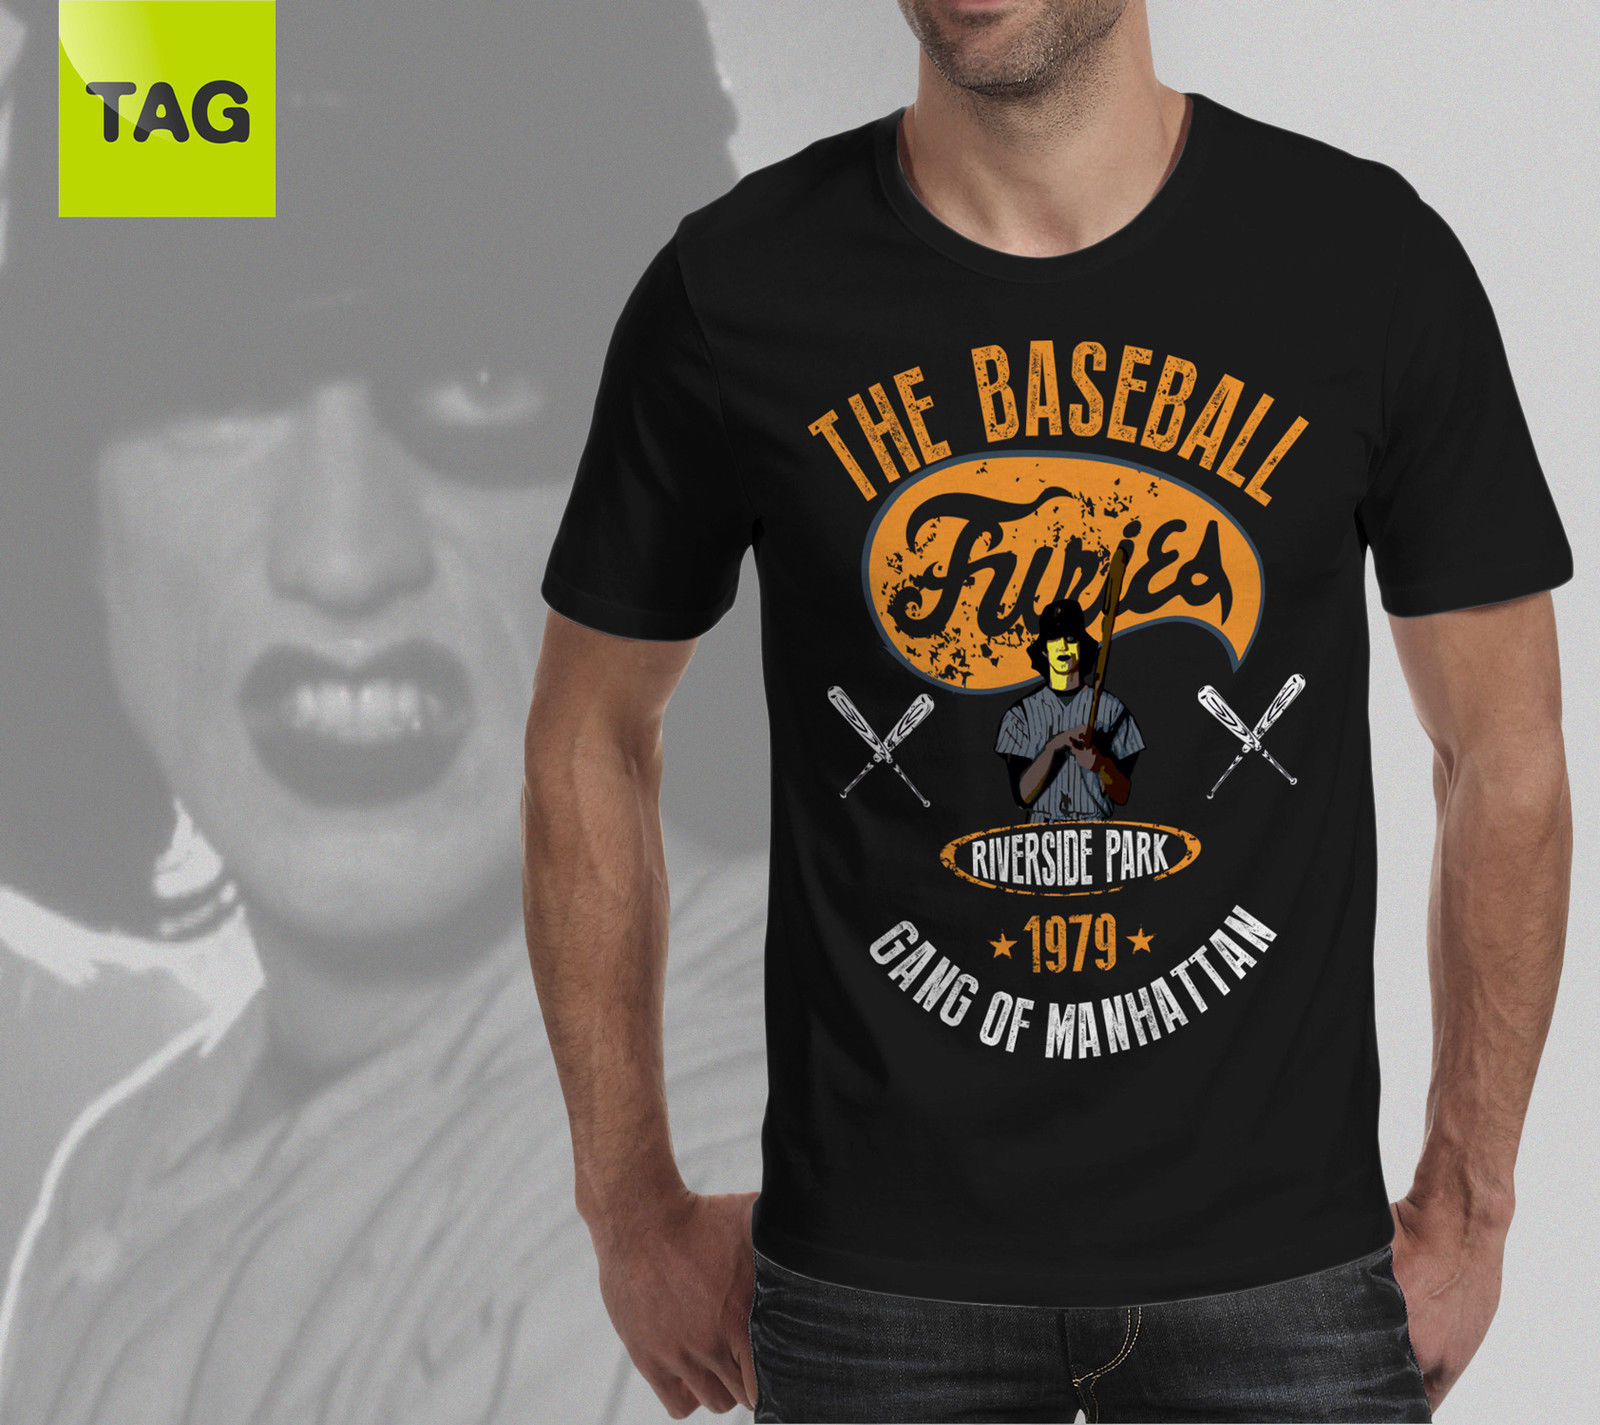 Hot New 2019 Summer Fashion T-shirt FURIES Movie BASEBALL - 1979 Vintage THE WARRIORS Tee Shirt